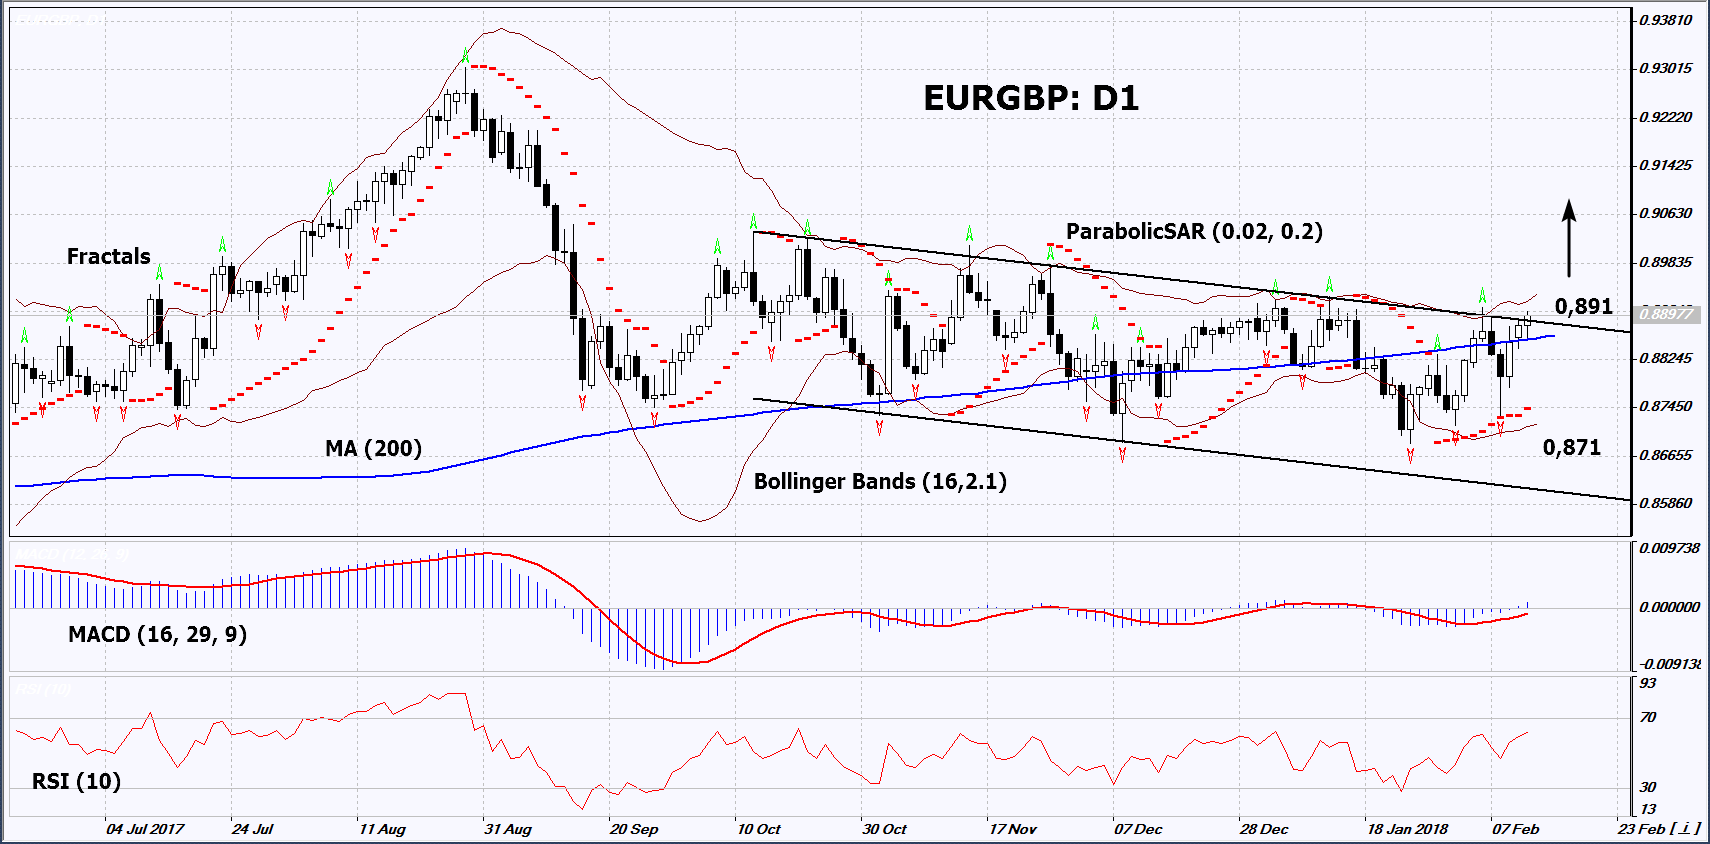 EUR/GBP D1 Chart